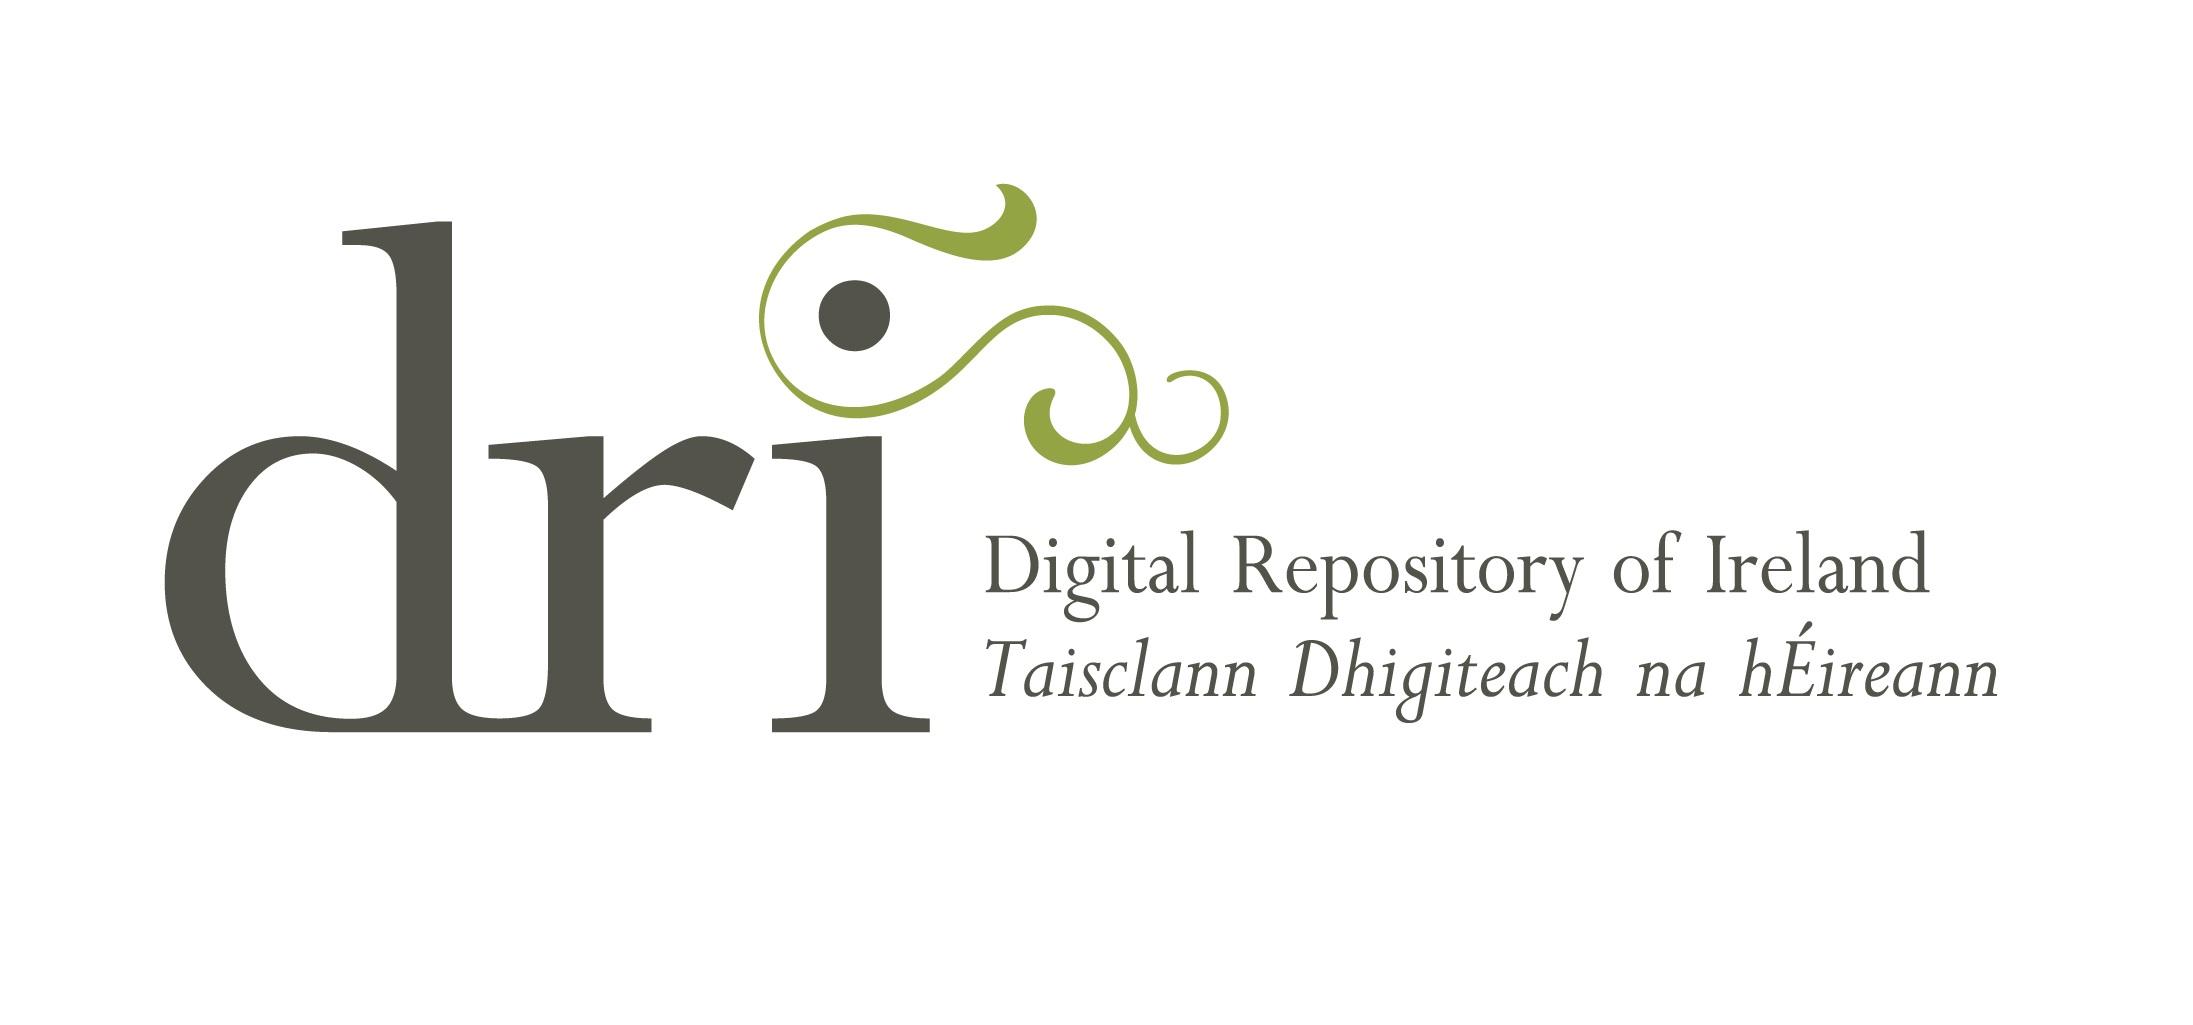 Digital Respository of Ireland logo